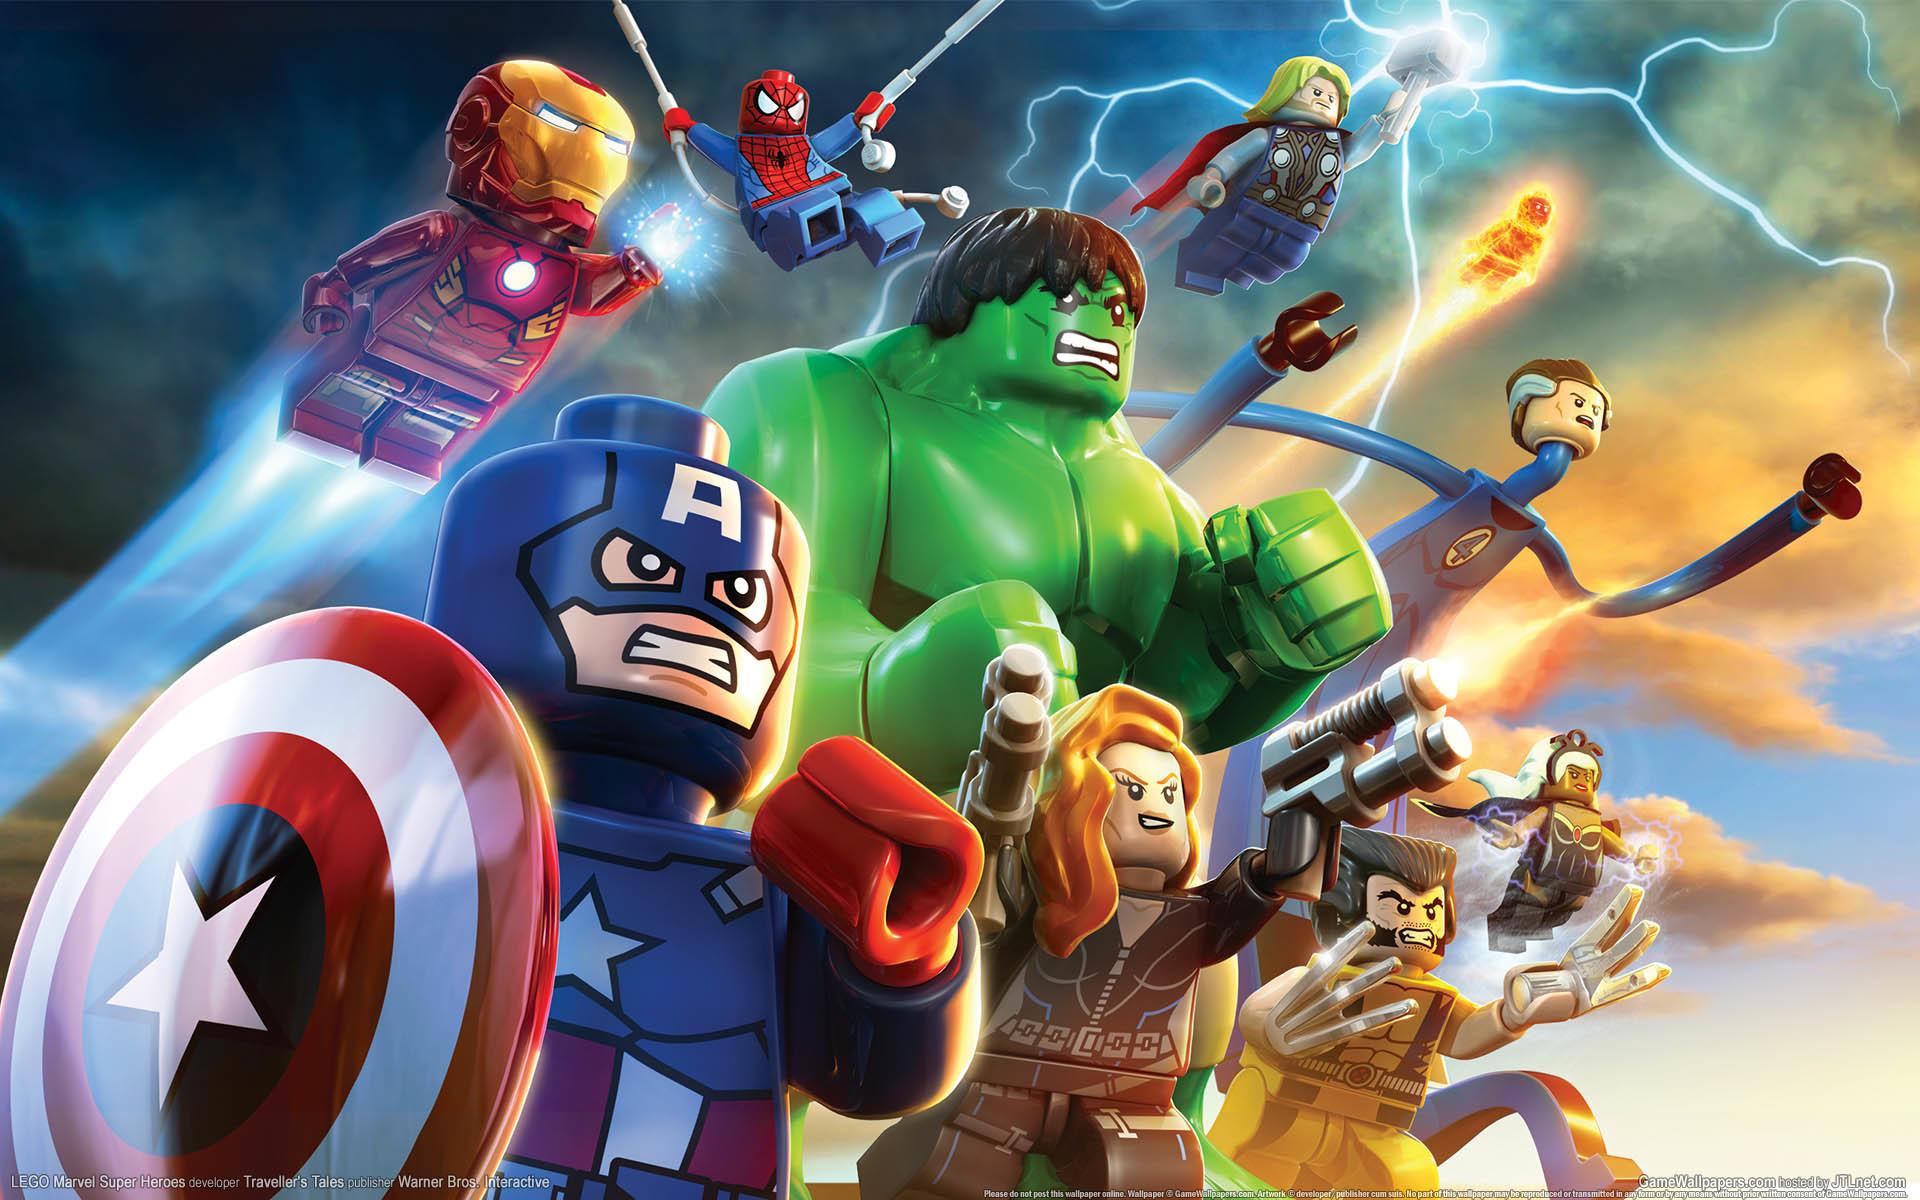 Lego Avengers Wallpaper HD (74+ images)